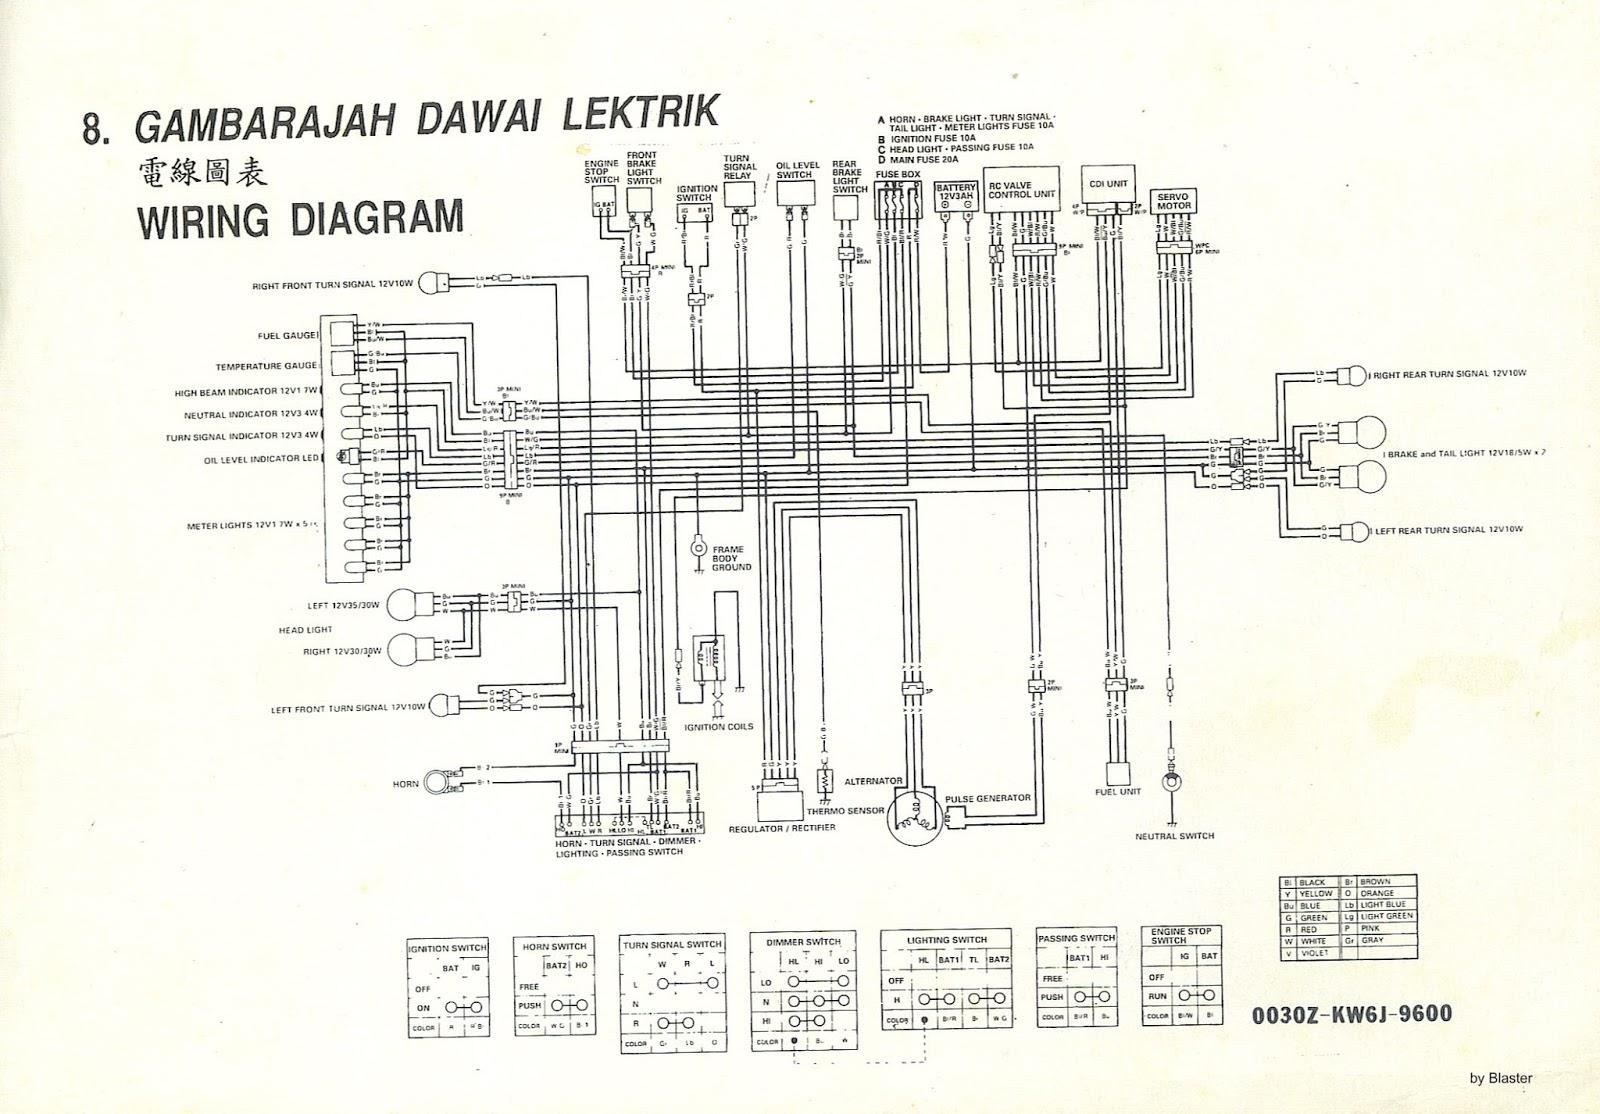 Nsr salatiga wiring diagram honda nsr series wiring diagram nsr 150 sp versi hitam putih cheapraybanclubmaster Image collections